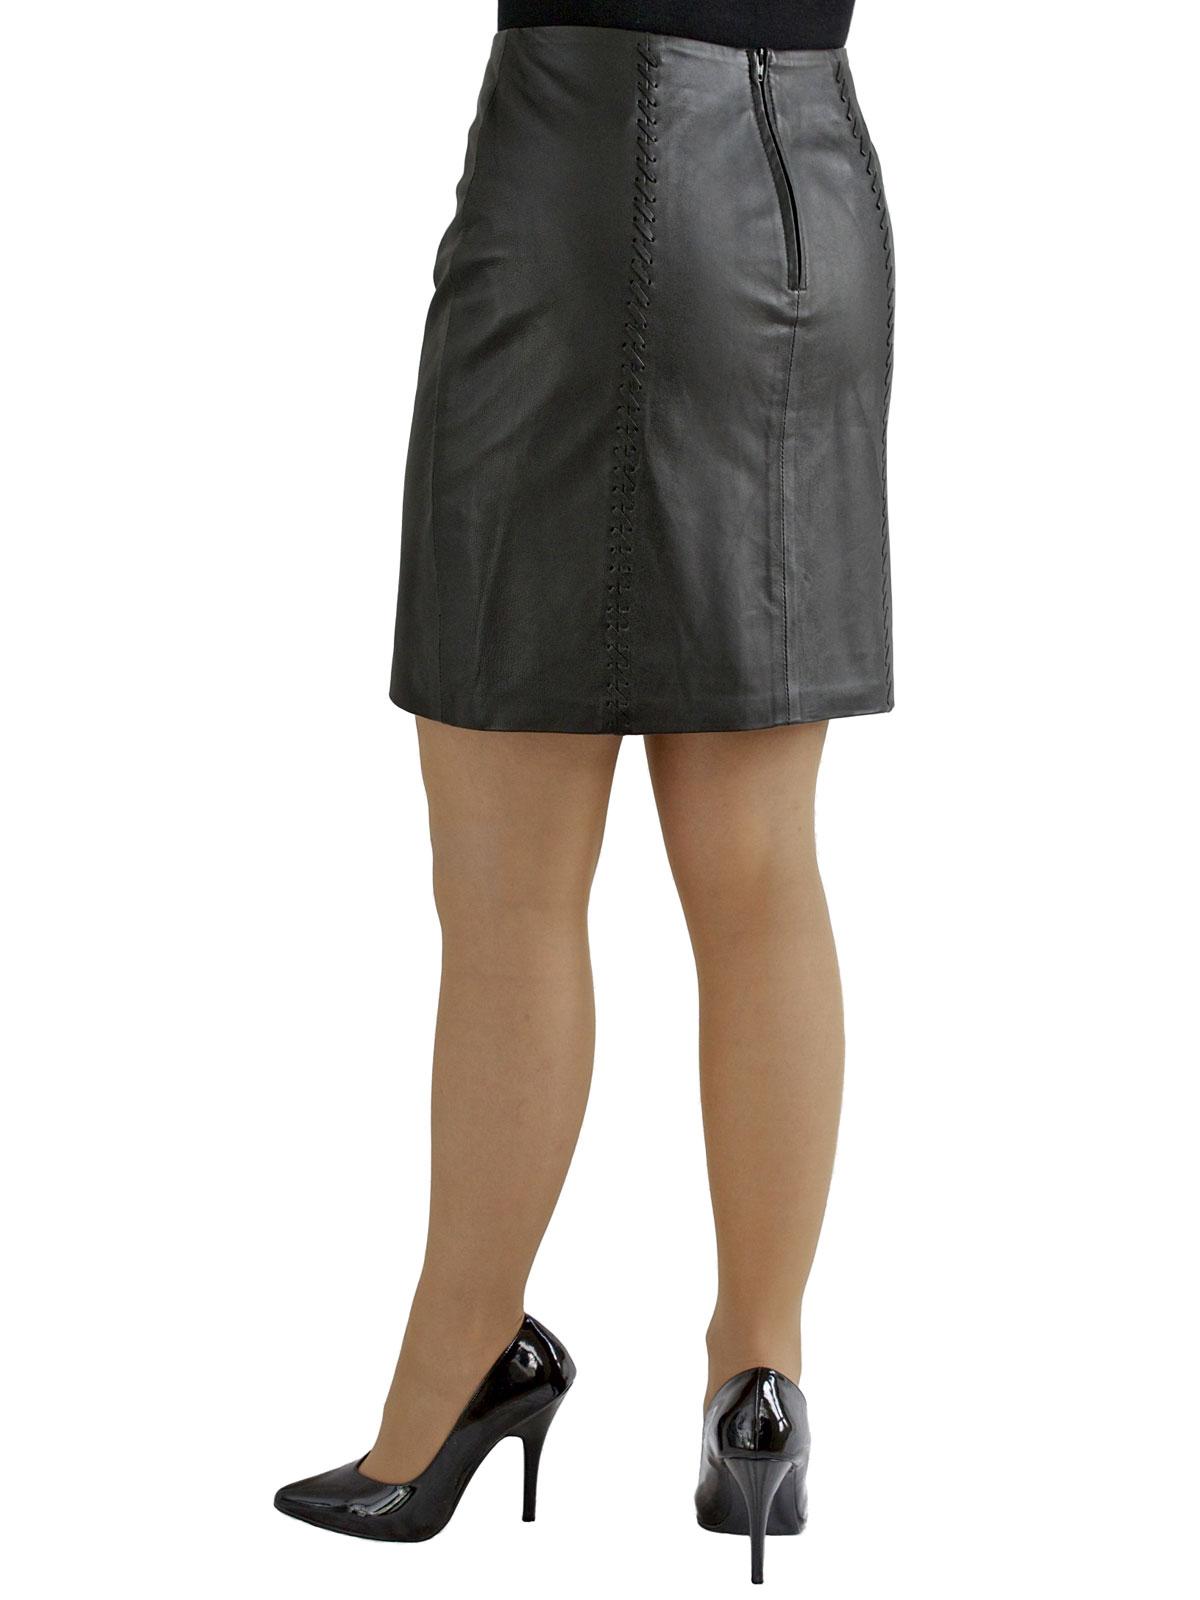 Black Soft Leather Mini Skirt, laced seams - Tout Ensemble